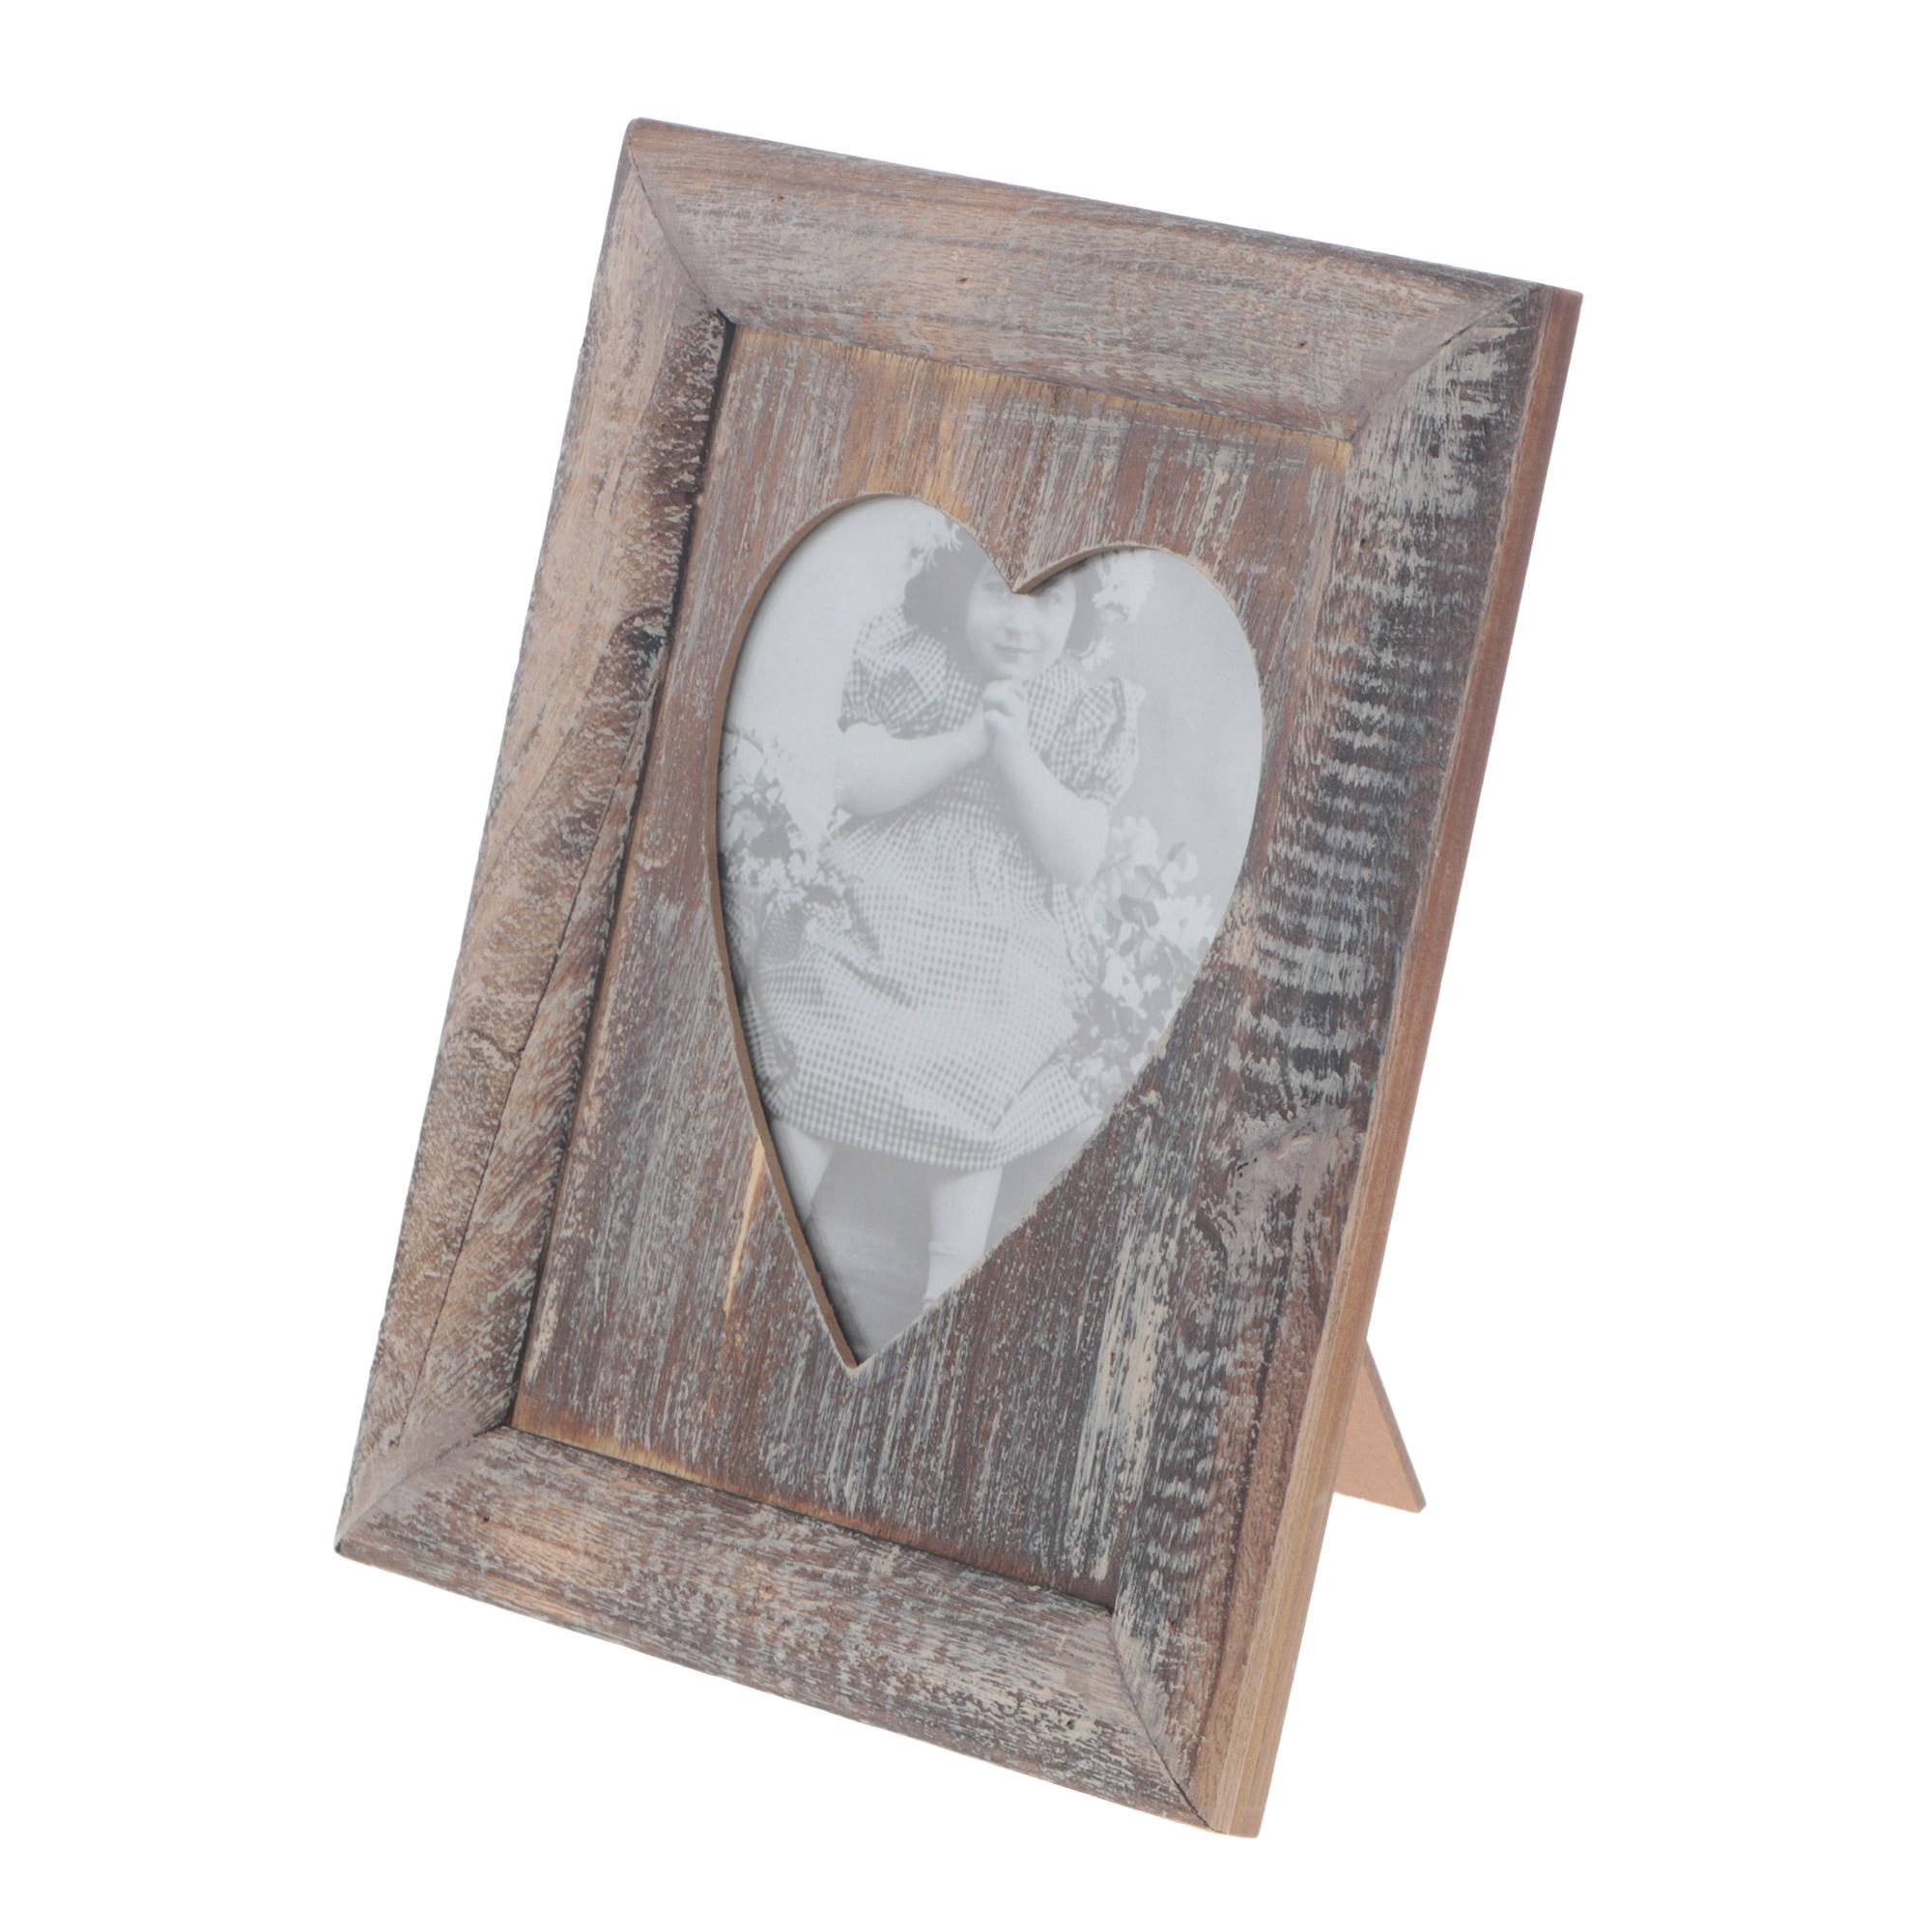 Рамка для фото Dekor pap декор 16.2х21.2cm рамка для фото arte fiorentino